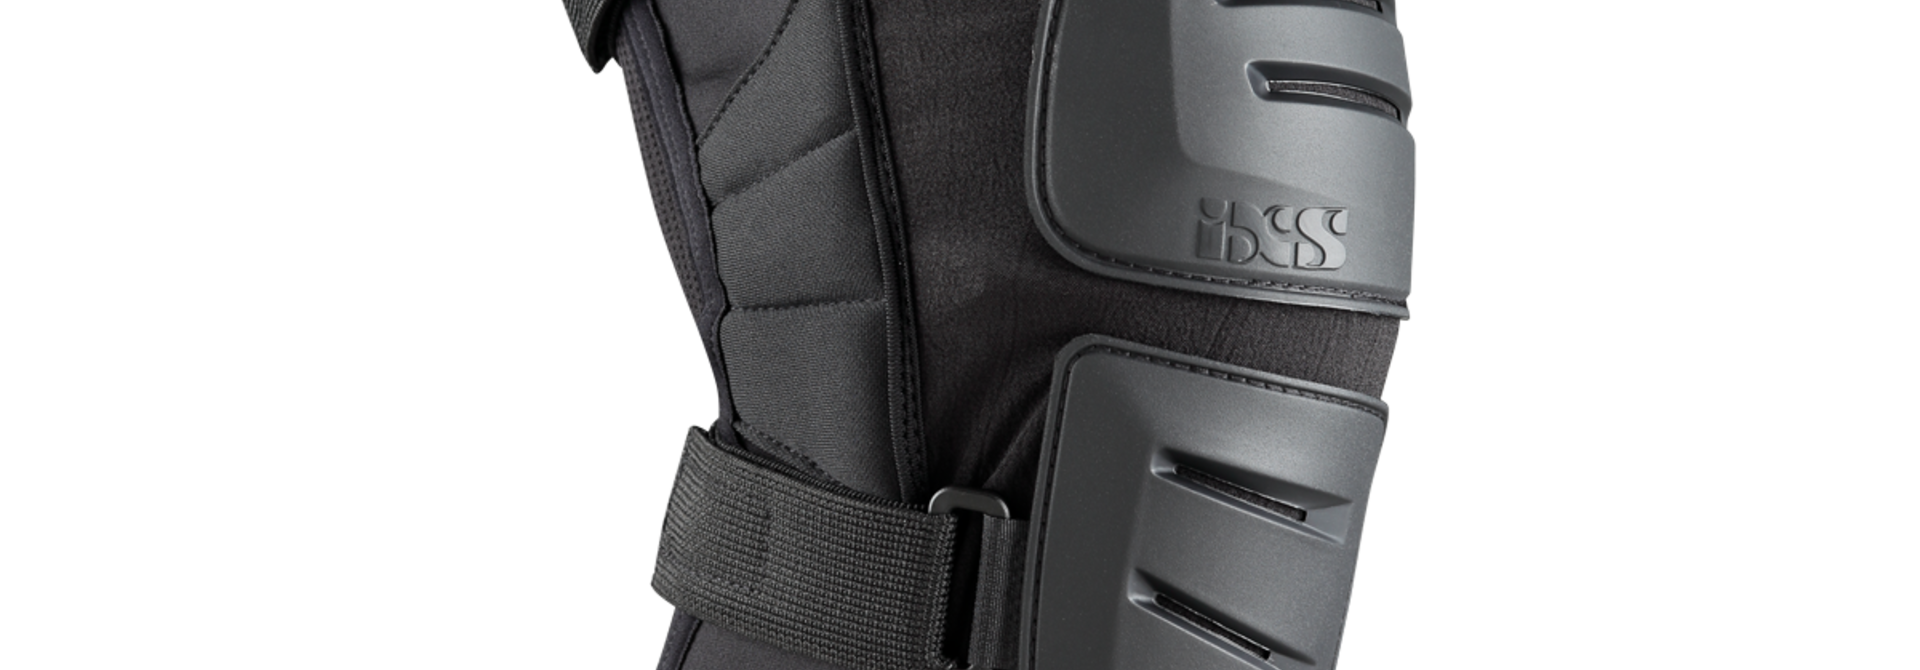 IXS Trigger Race Knee Pads